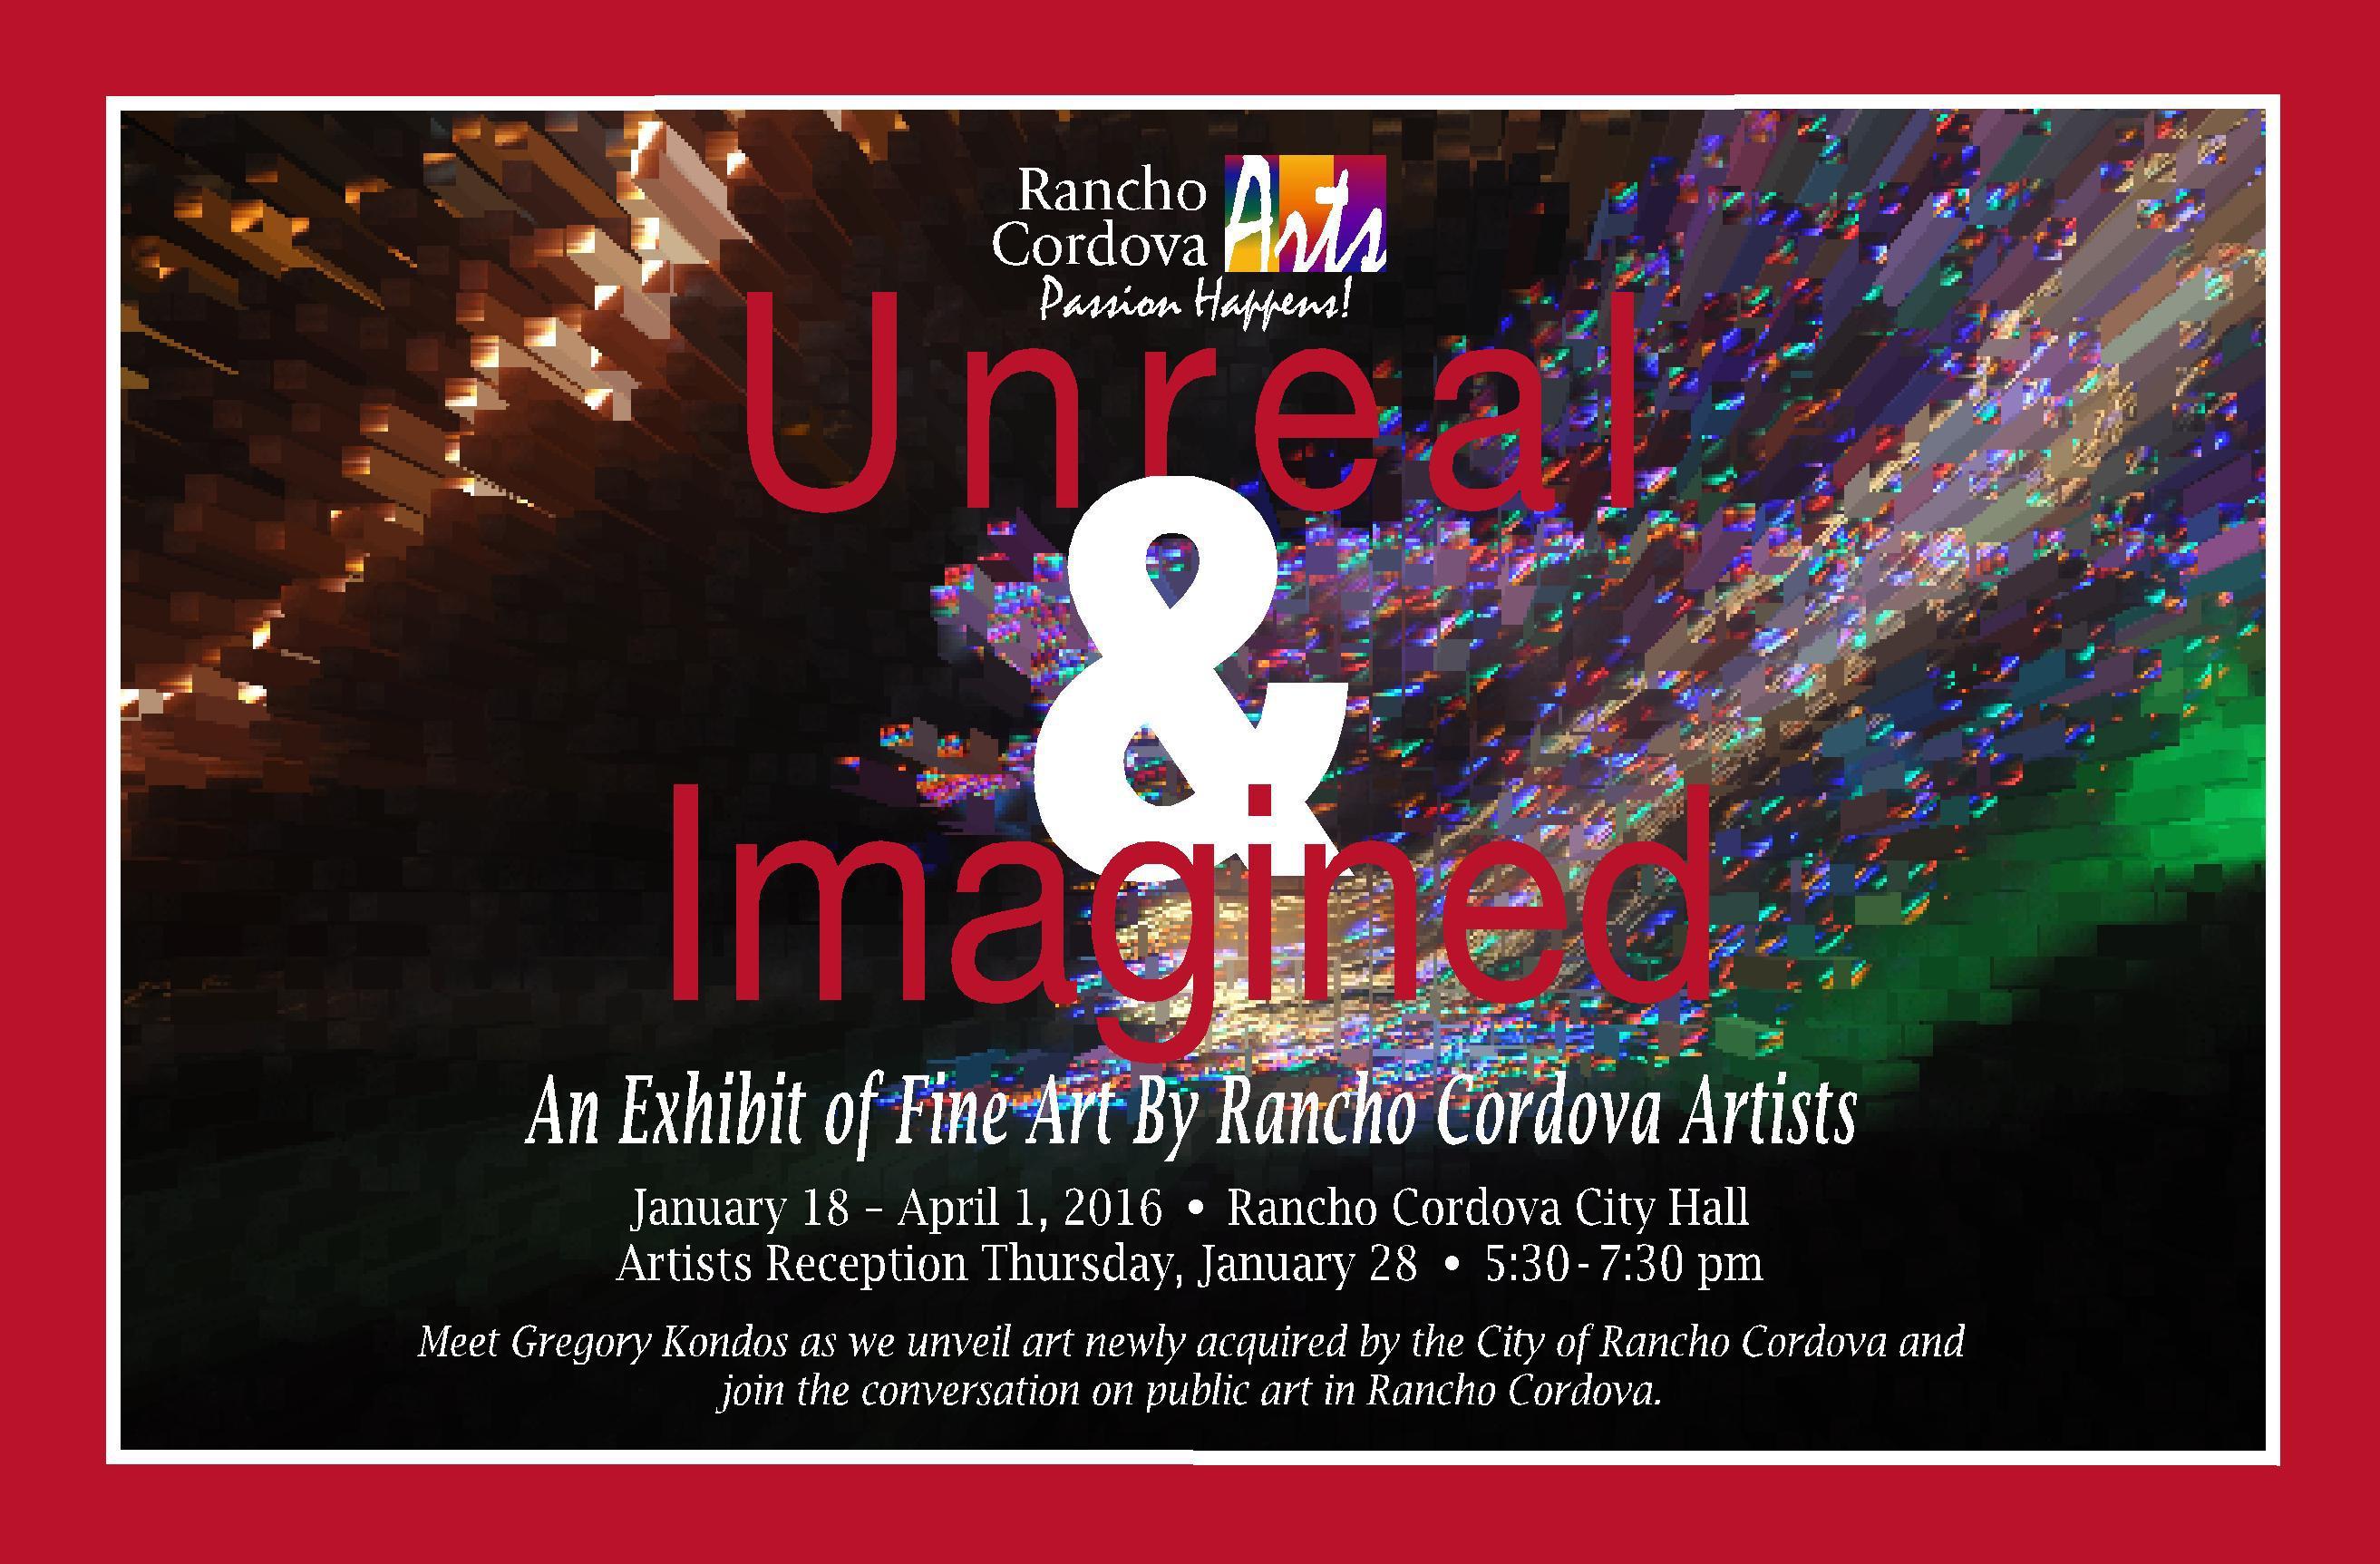 Rancho Cordova Arts Exhibit Real & Imagined image